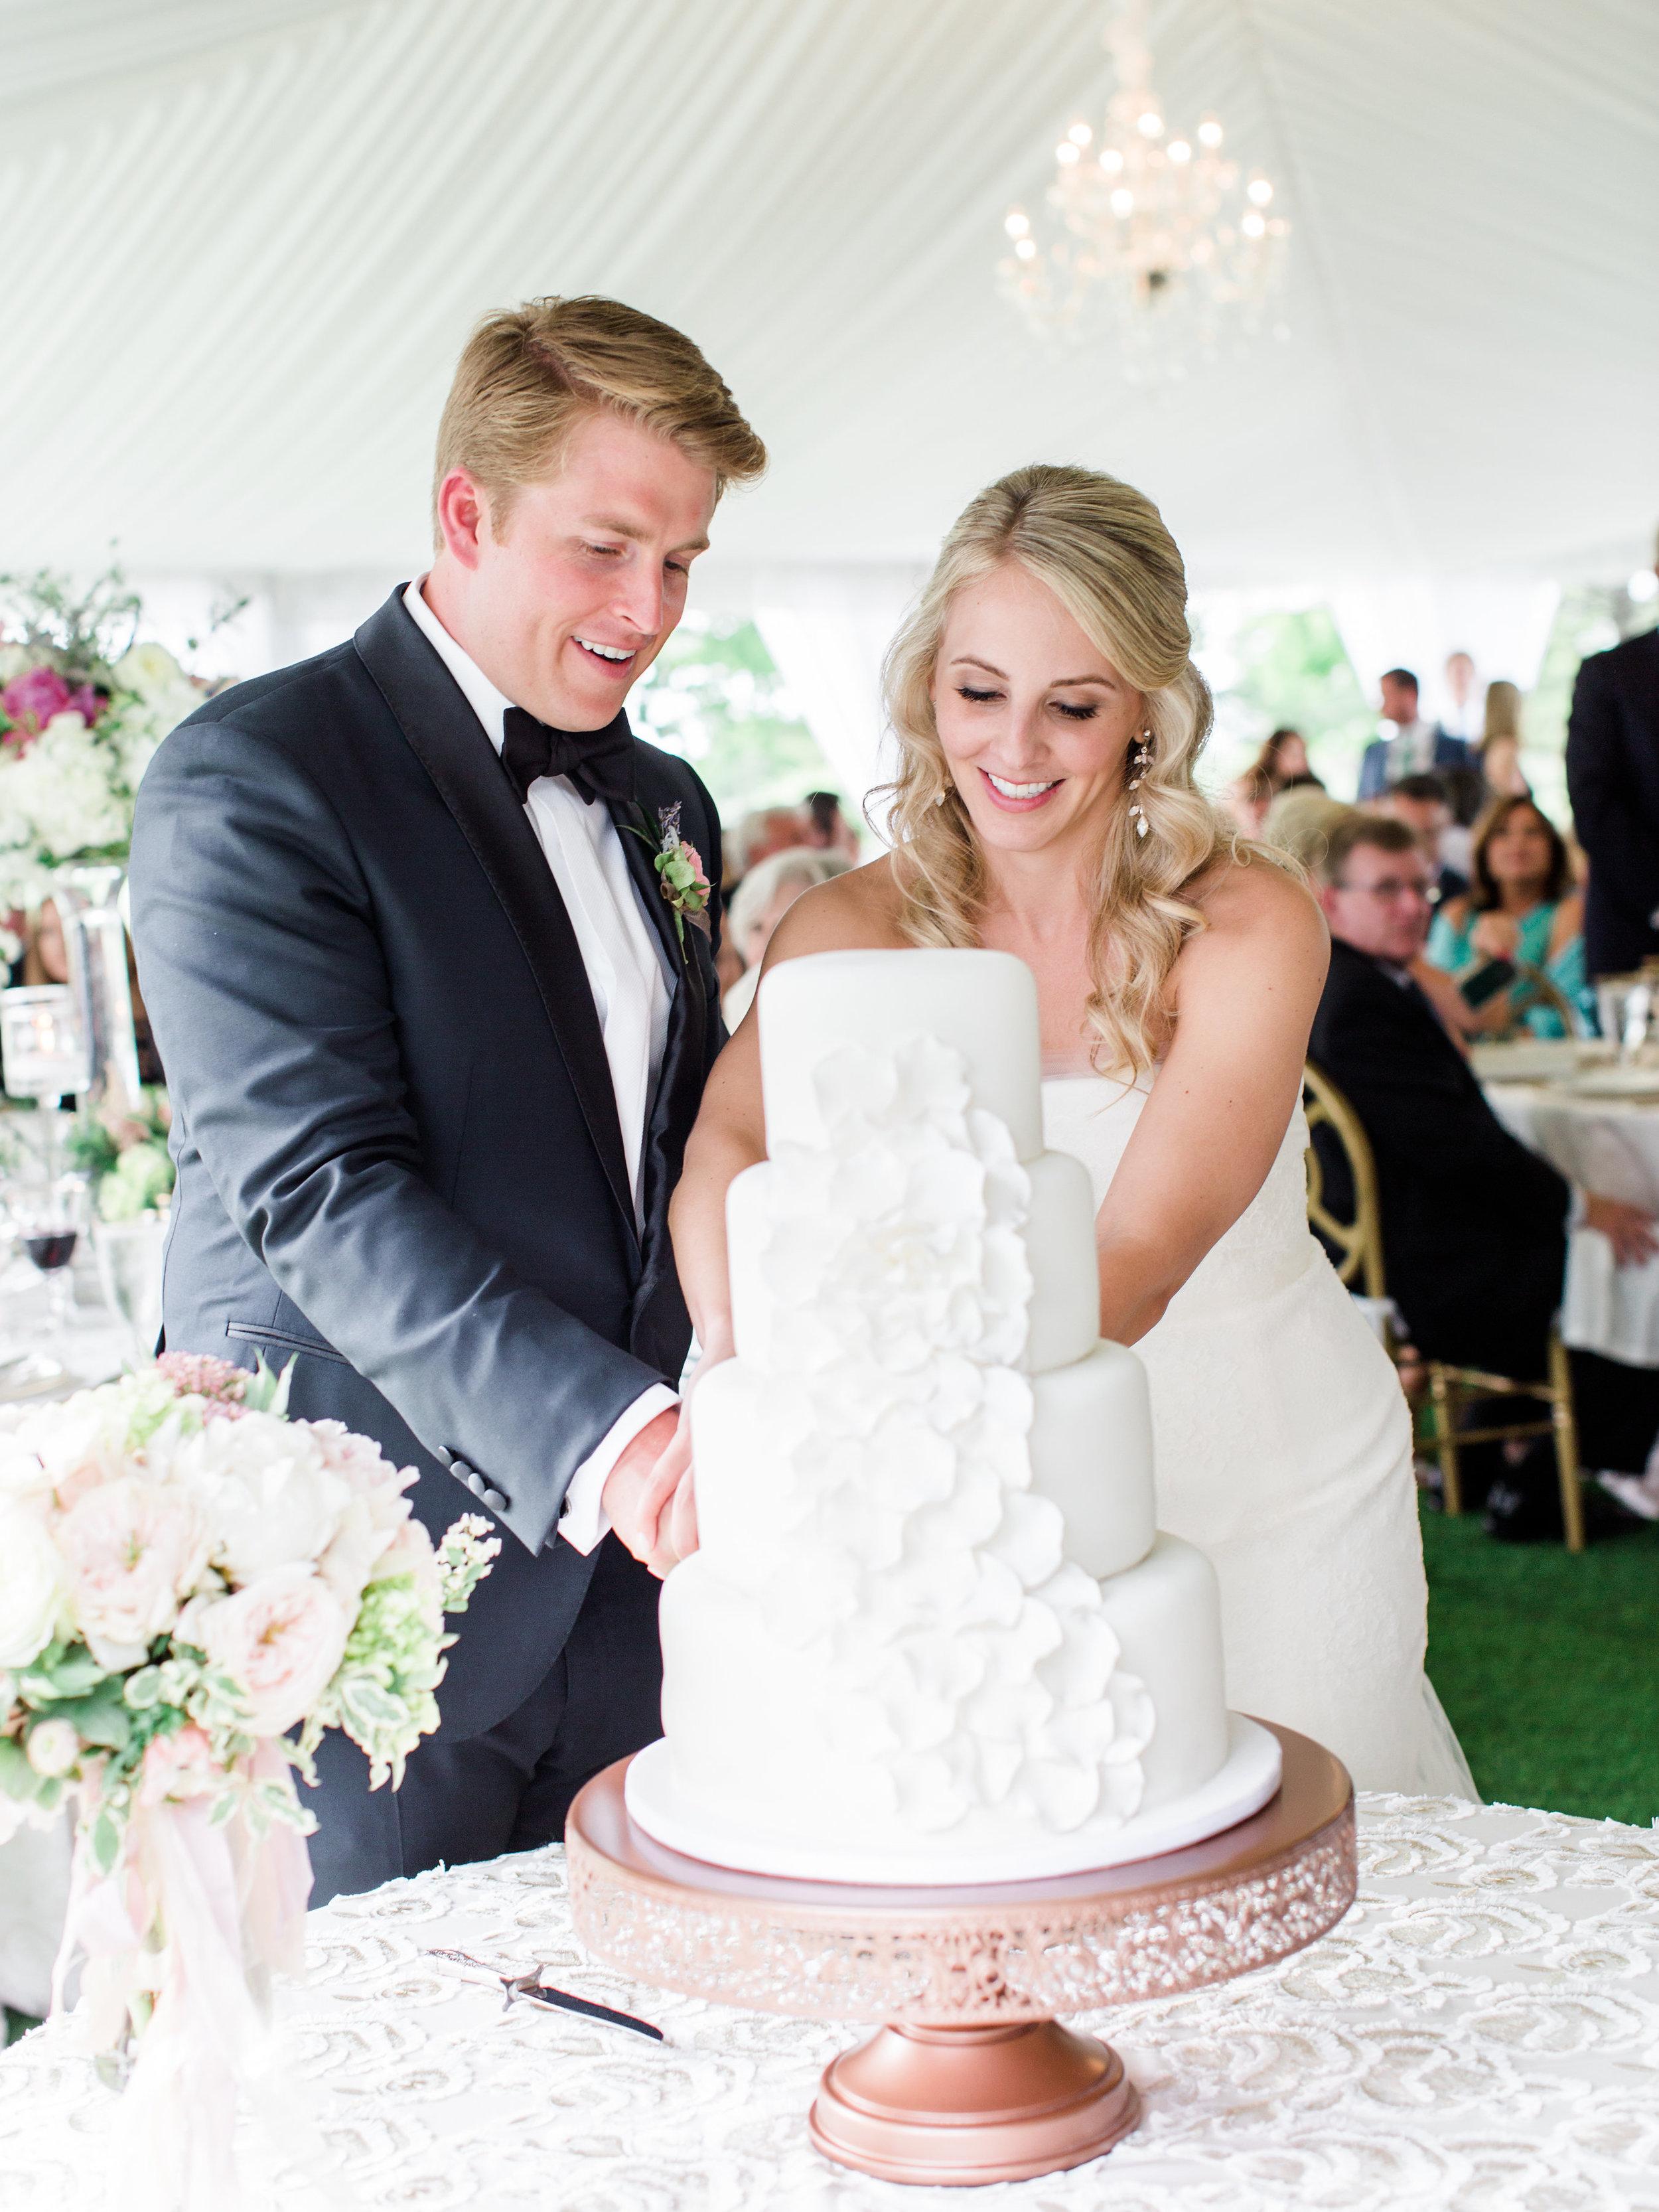 Coffman+Wedding+Reception-11.jpg